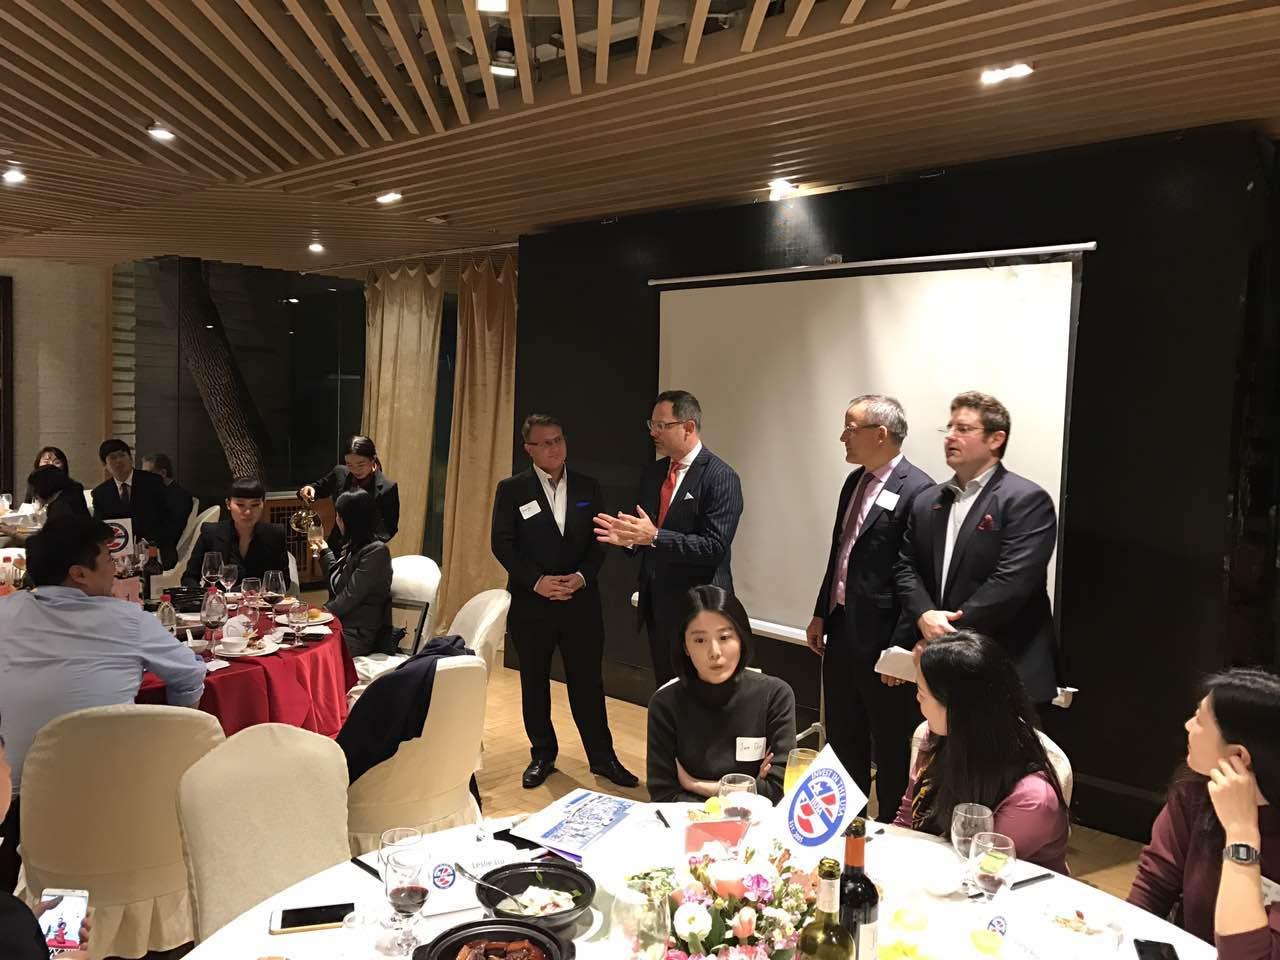 IIUSA Board Members Cletus Weber (Peng & Weber, PLLC), Rafael Anchia (Civitas Capital Group) and George Ekins (American Dream Fund) provide the audience EB-5 legislative updates